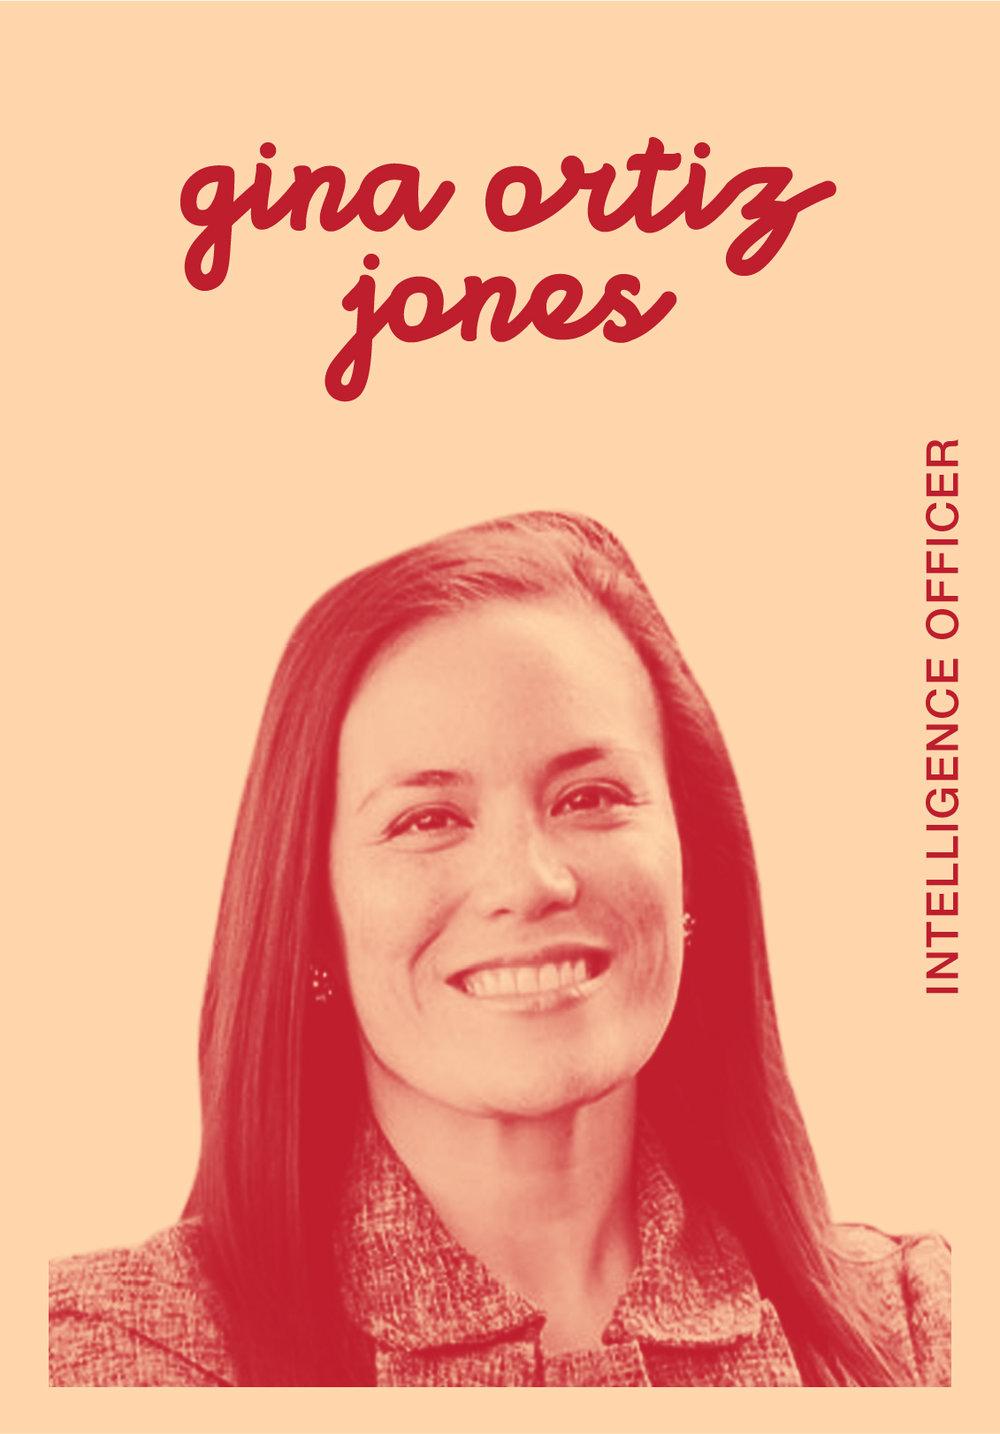 Gina Ortiz Jones   WEBSITE   @GINAORTIZJONES   IG: GINAORTIZJONESTX